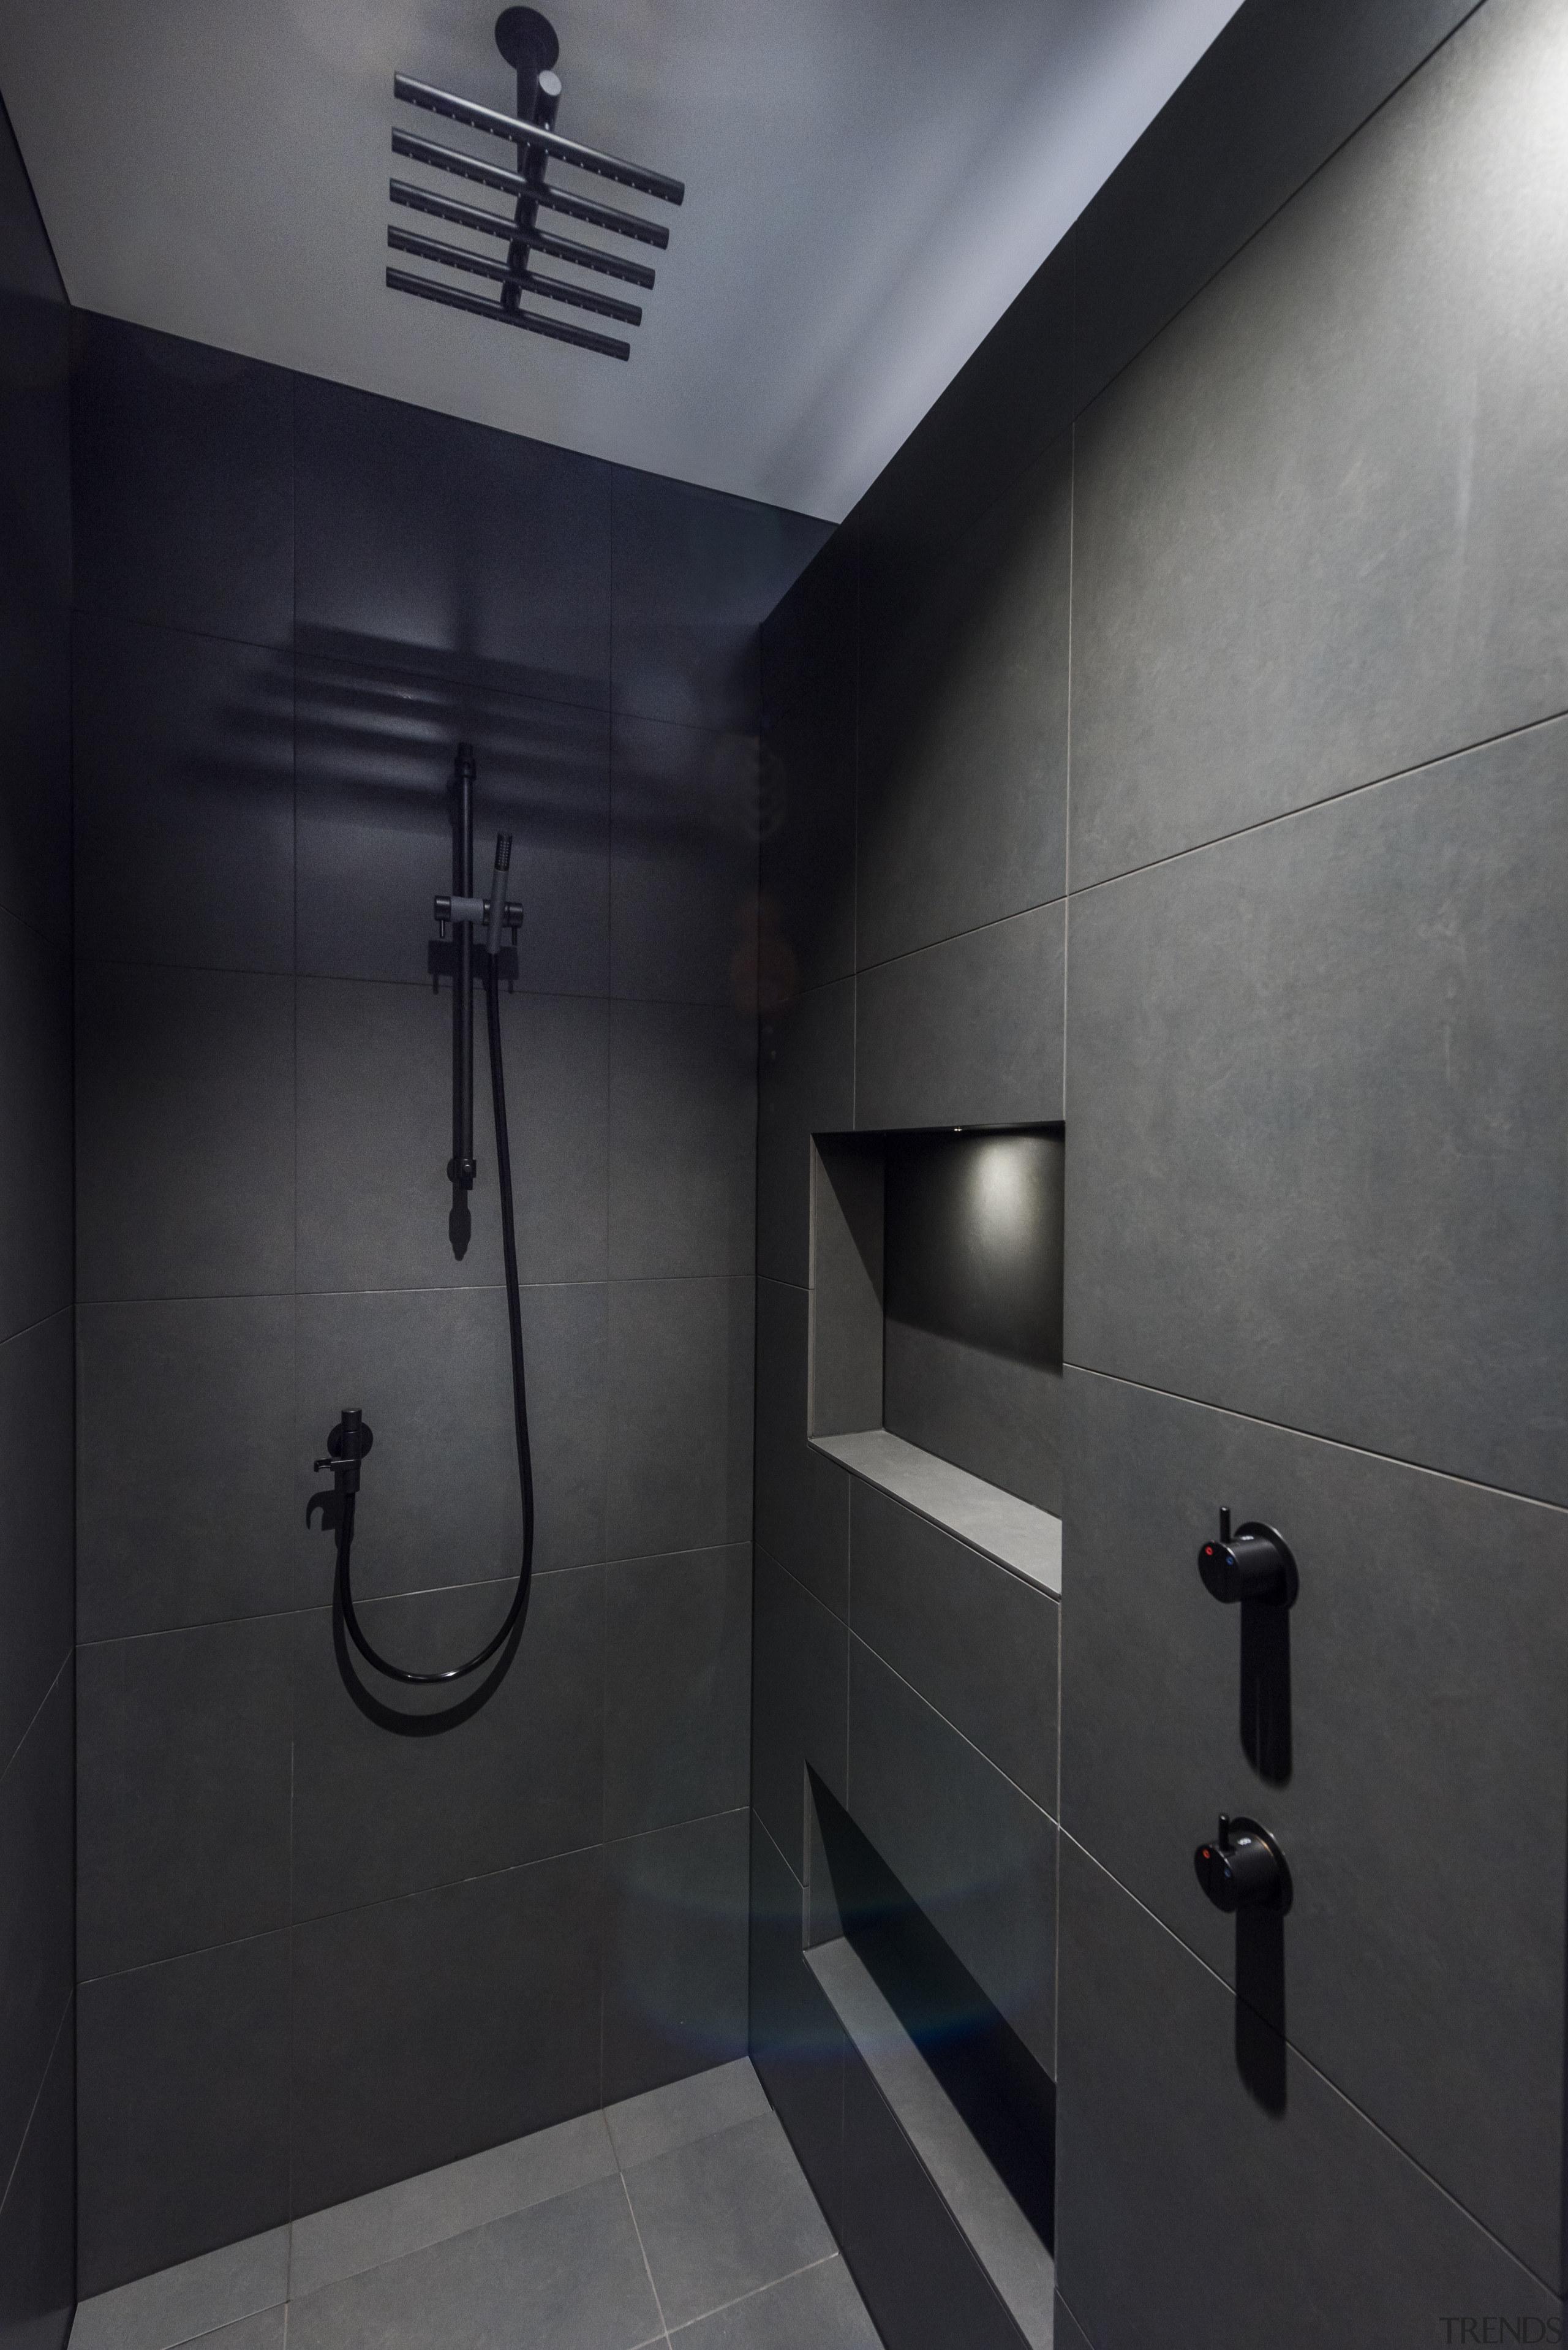 Black fittings all but disappear against the matt architecture, bathroom, black fittings, interior design, plumbing fixture, walk in shower, davinia sutton